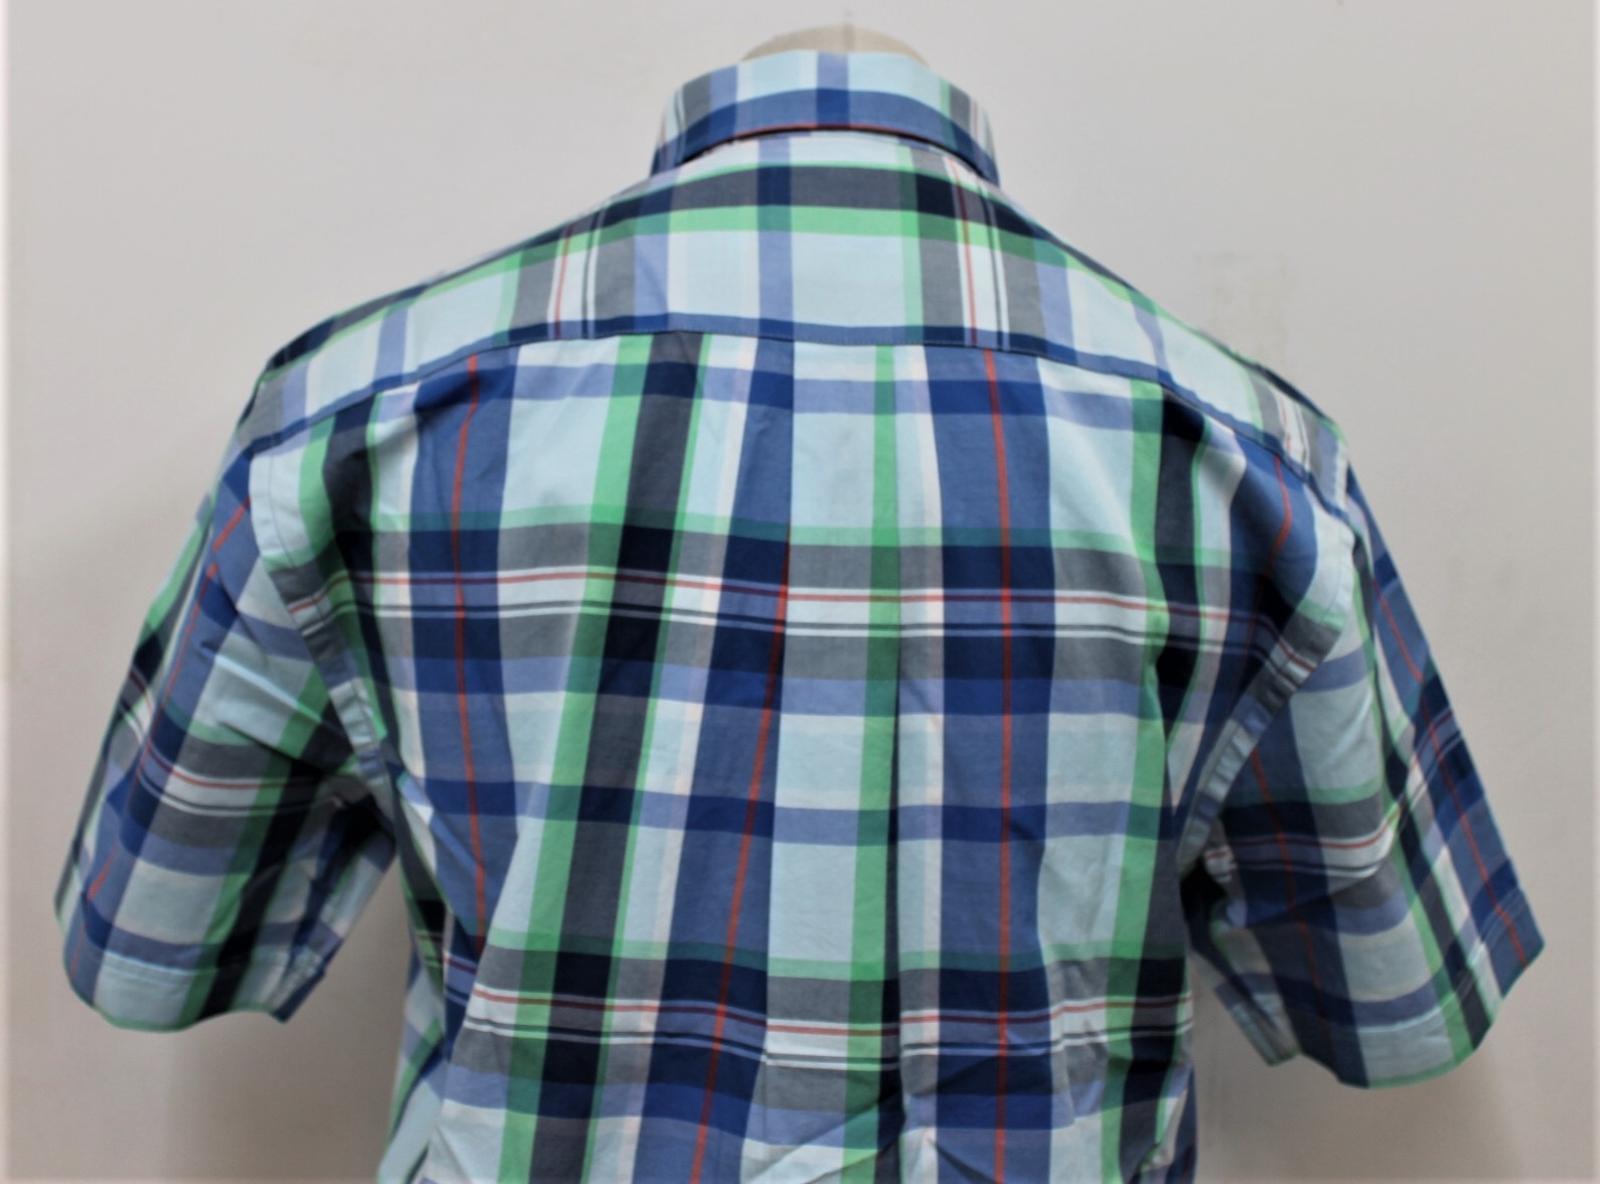 M Size Short Streatham R Bnwt Williams Shirt Blue m Checked Men's Green Sleeve nAAPf7H